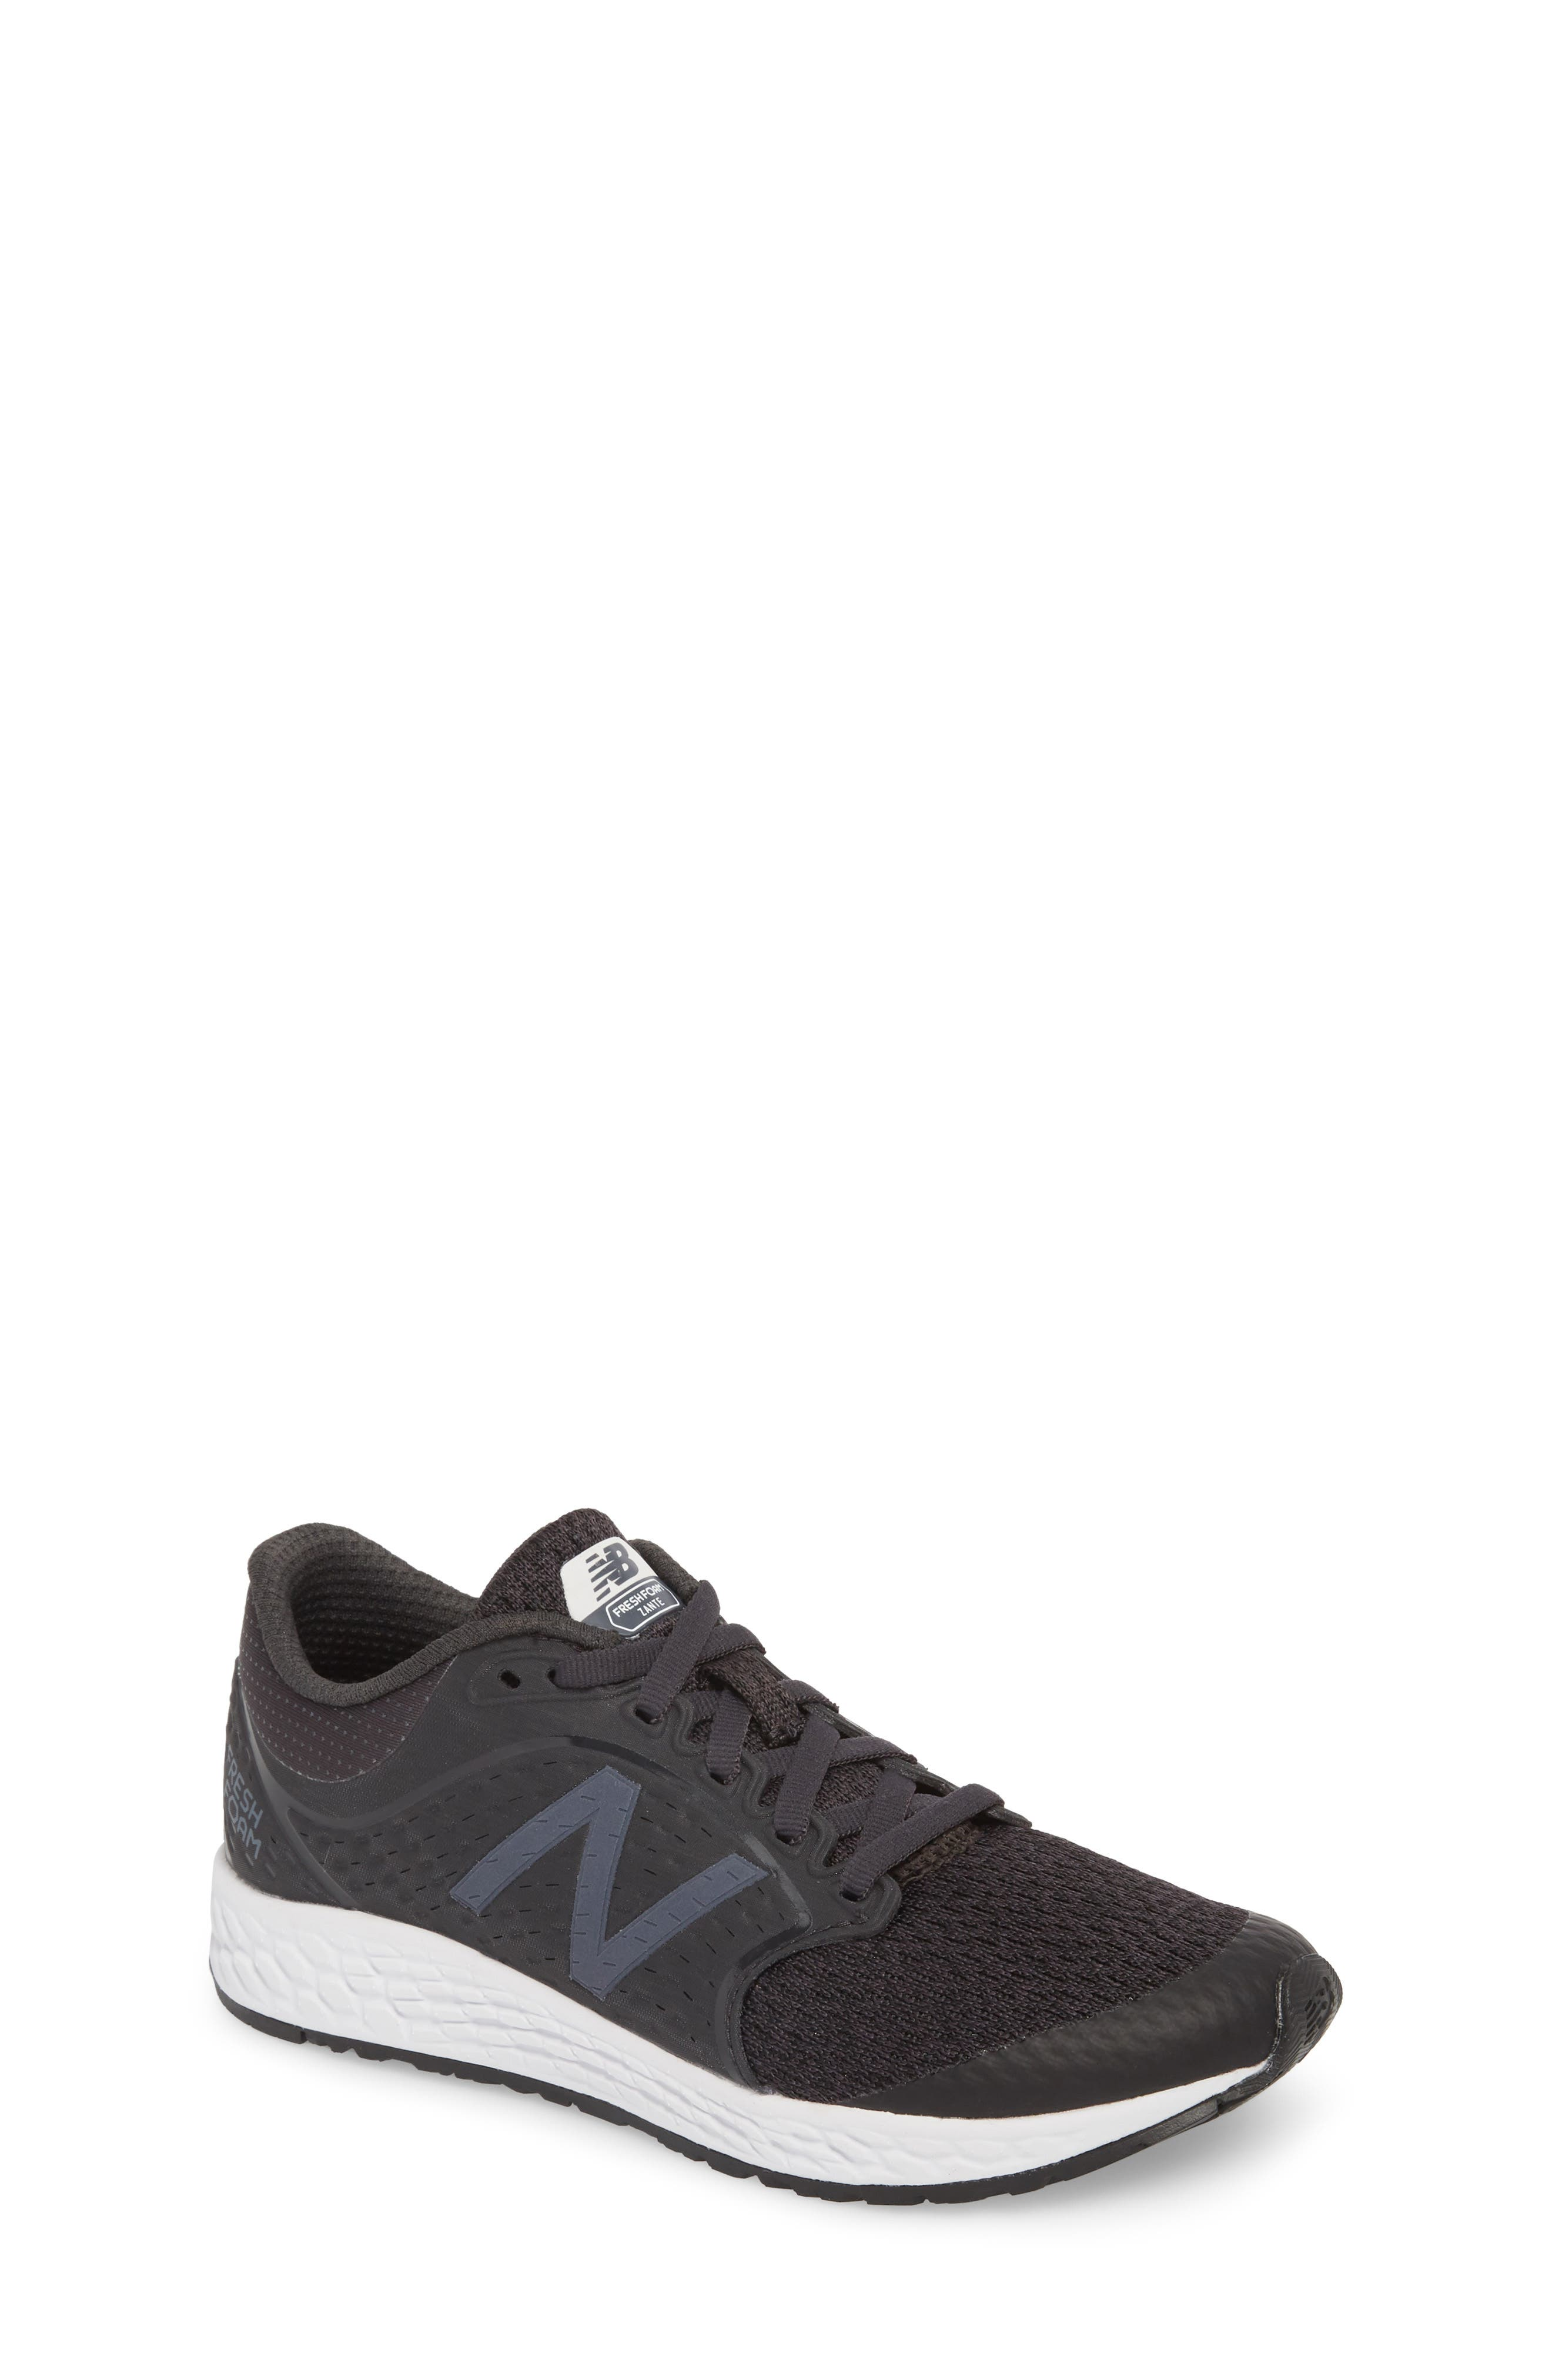 Fresh Foam Zante v4 Running Shoe,                             Main thumbnail 1, color,                             Black/ White